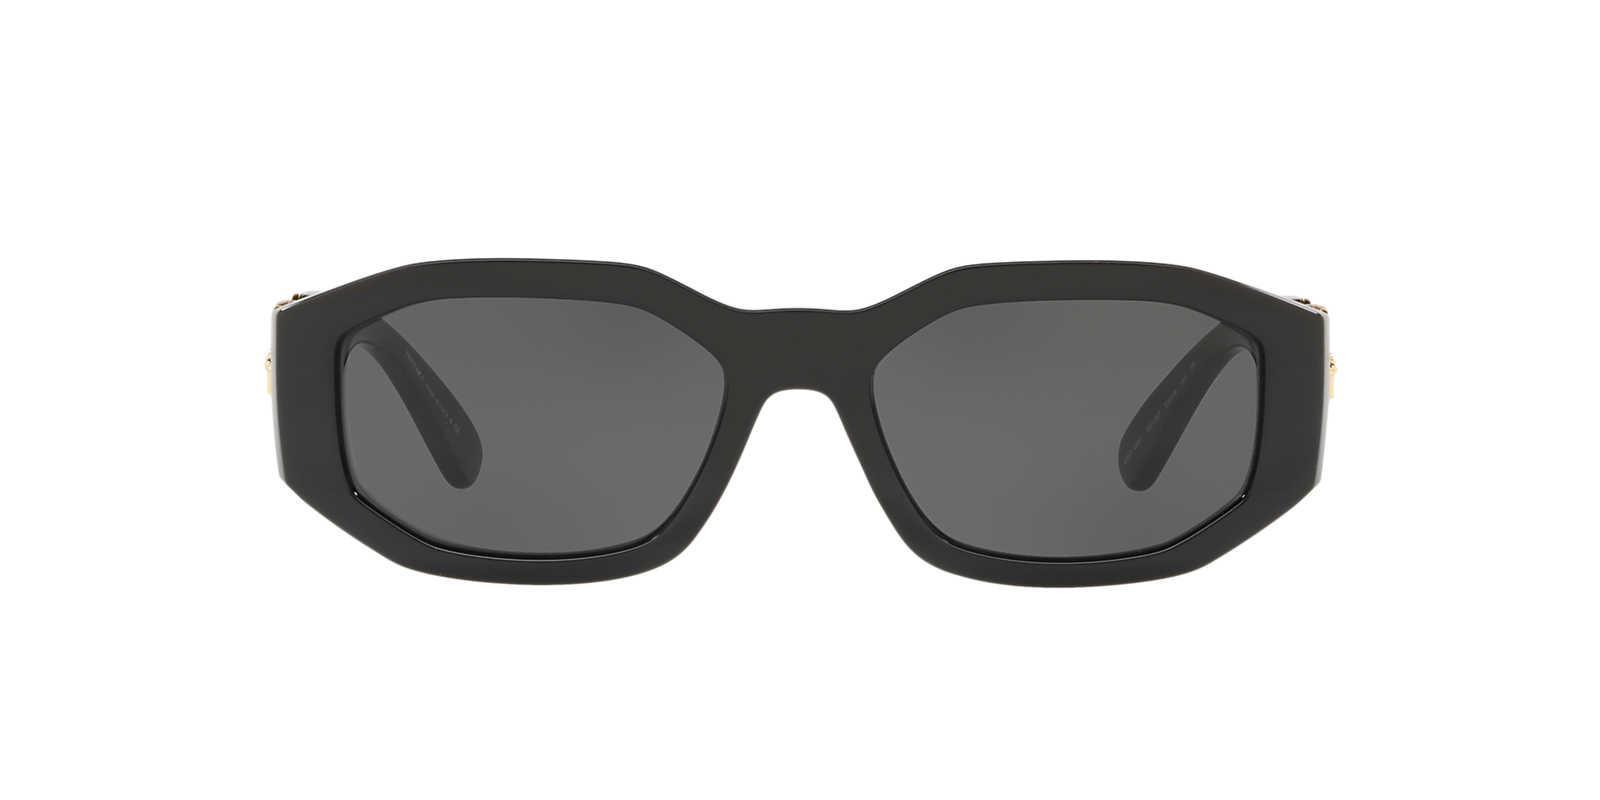 e5b3d163dd11 Versace Unisex Sunglass Ve4361 53 in Black - Save 14.574898785425106 ...